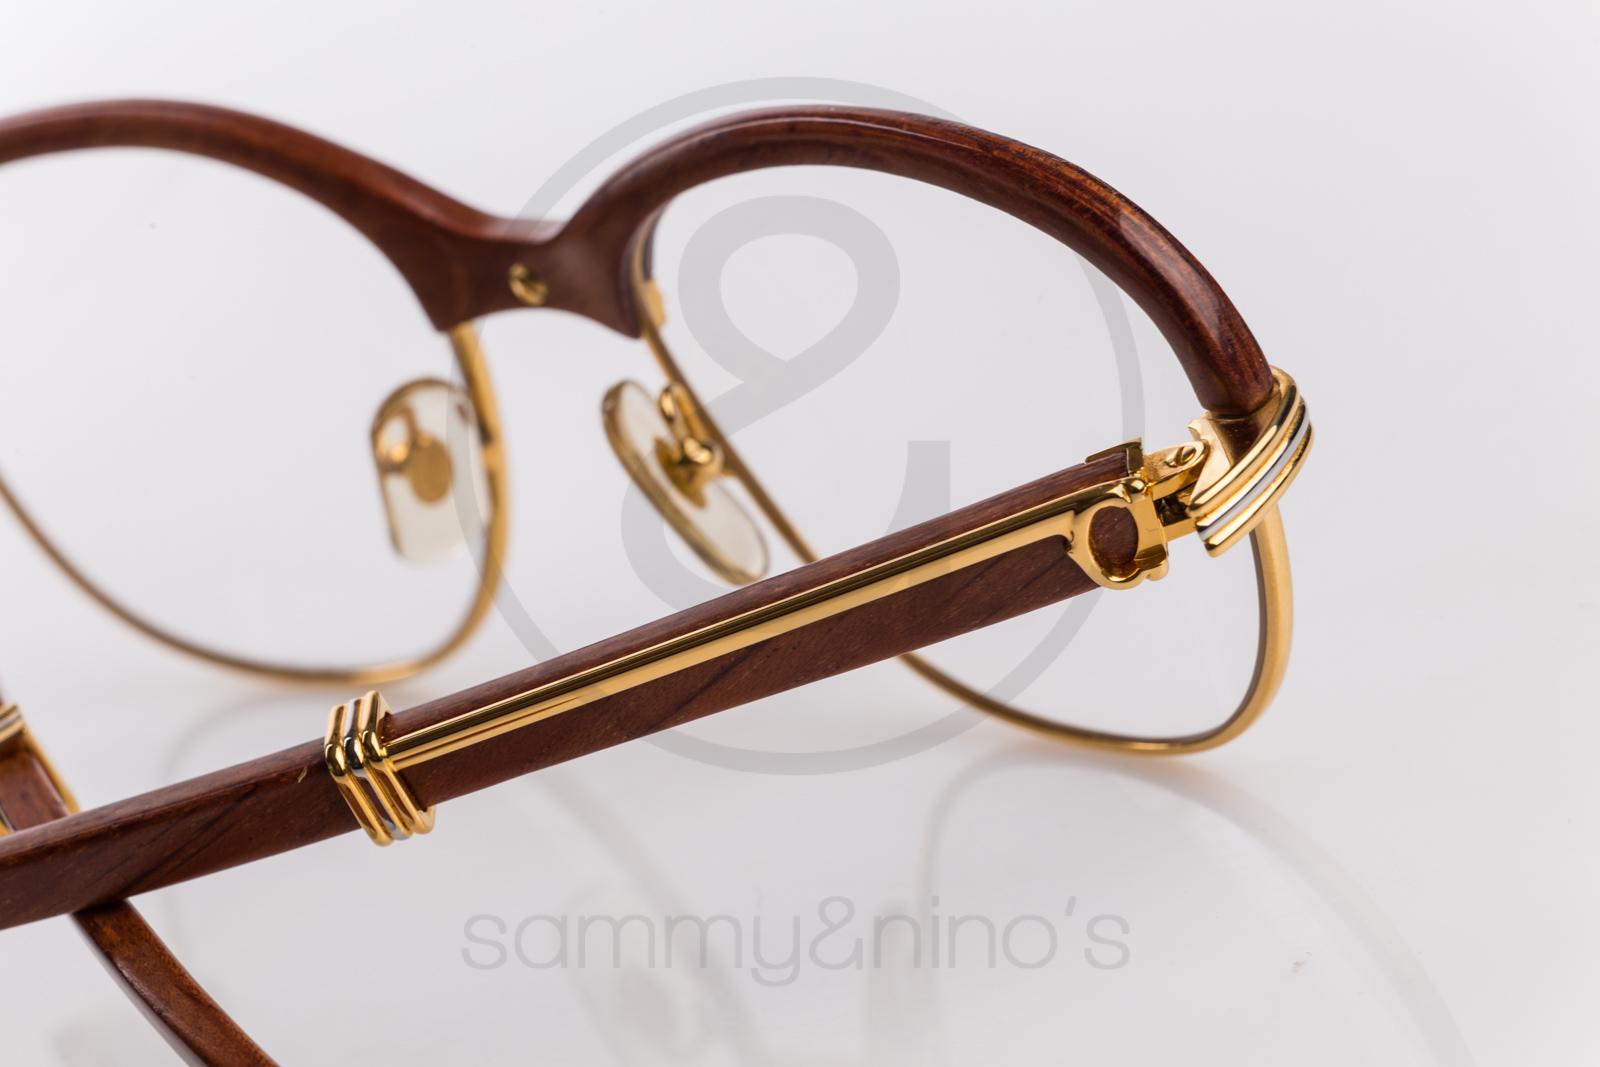 Cartier Malmaison 56 19 Sammy Amp Nino S Store